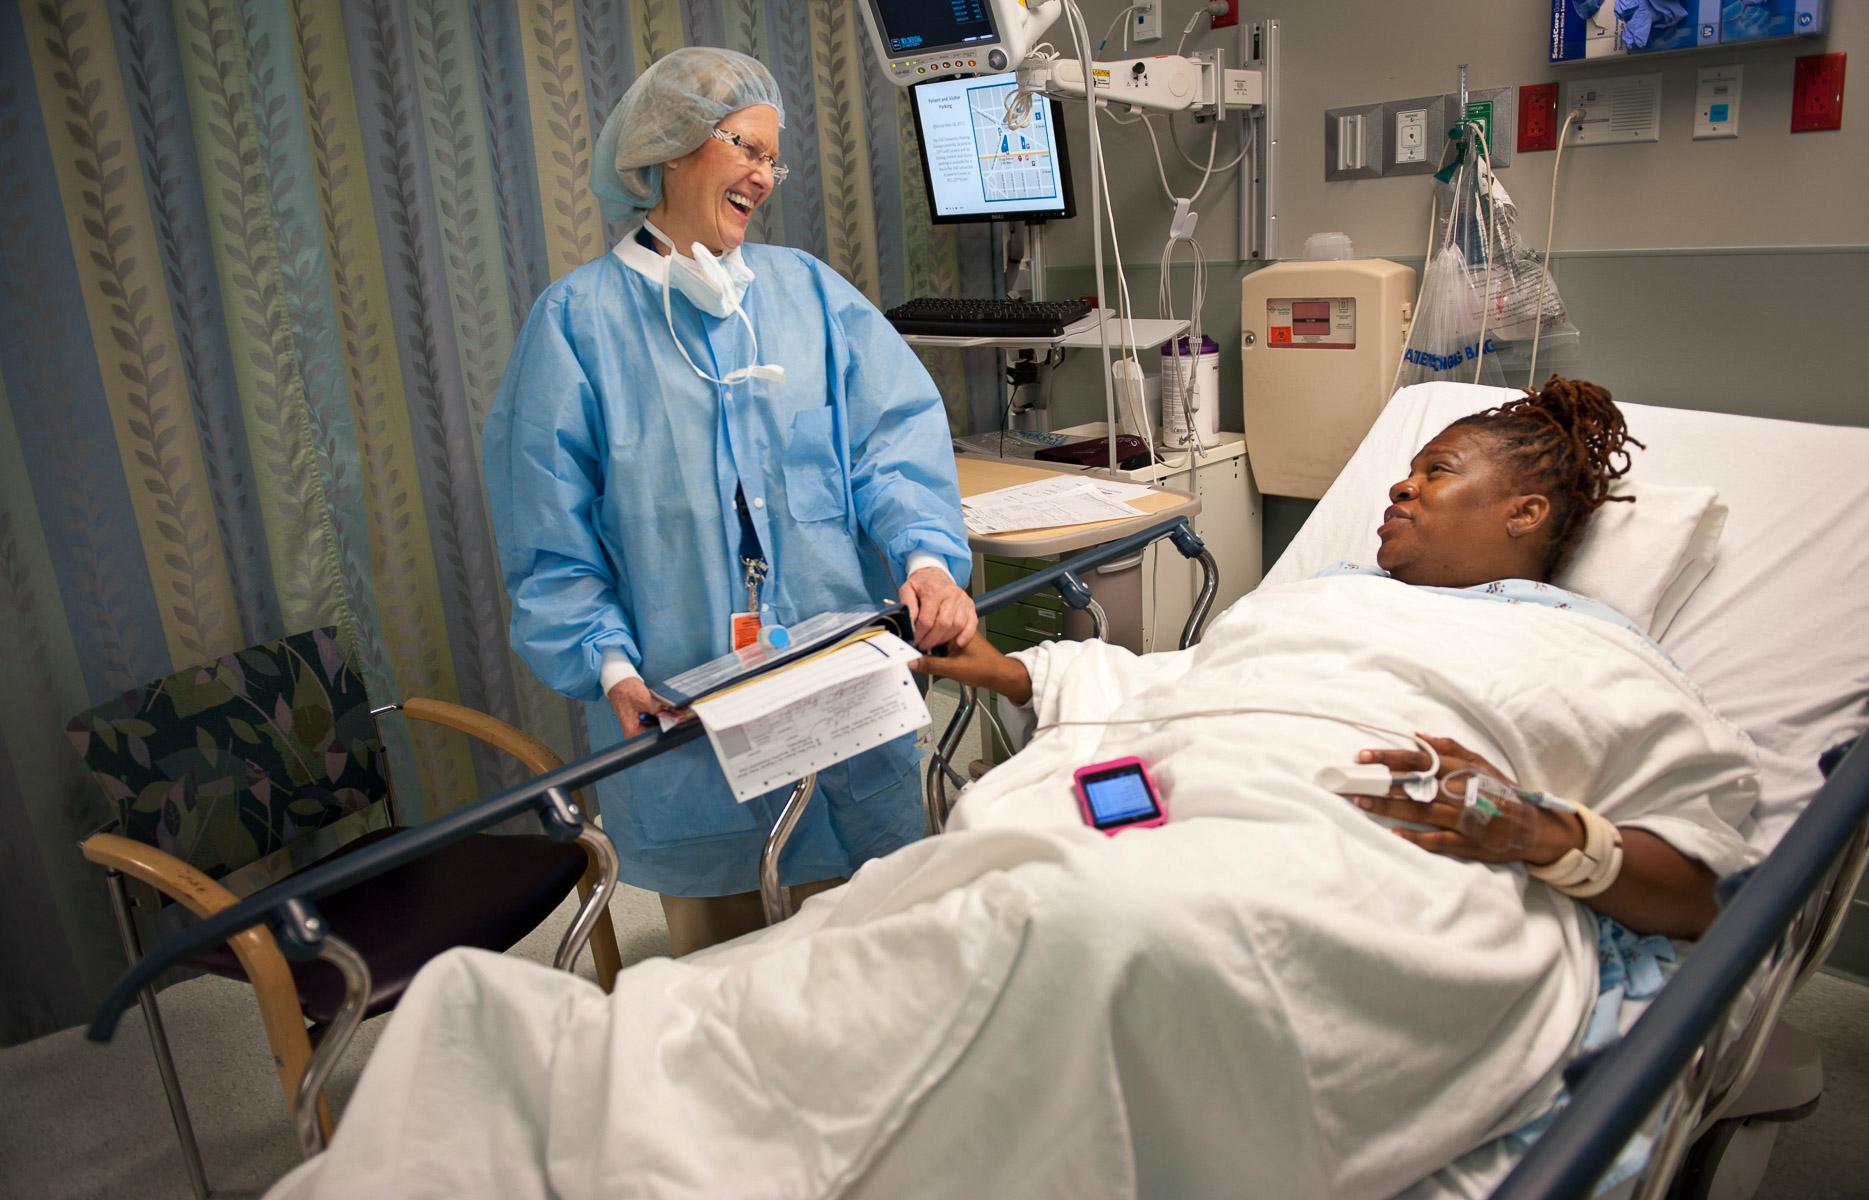 Juanita Britton prepares for gastric bypass surgery at Washington University Hospital in  Washington D.C. (C)Vanessa Vick